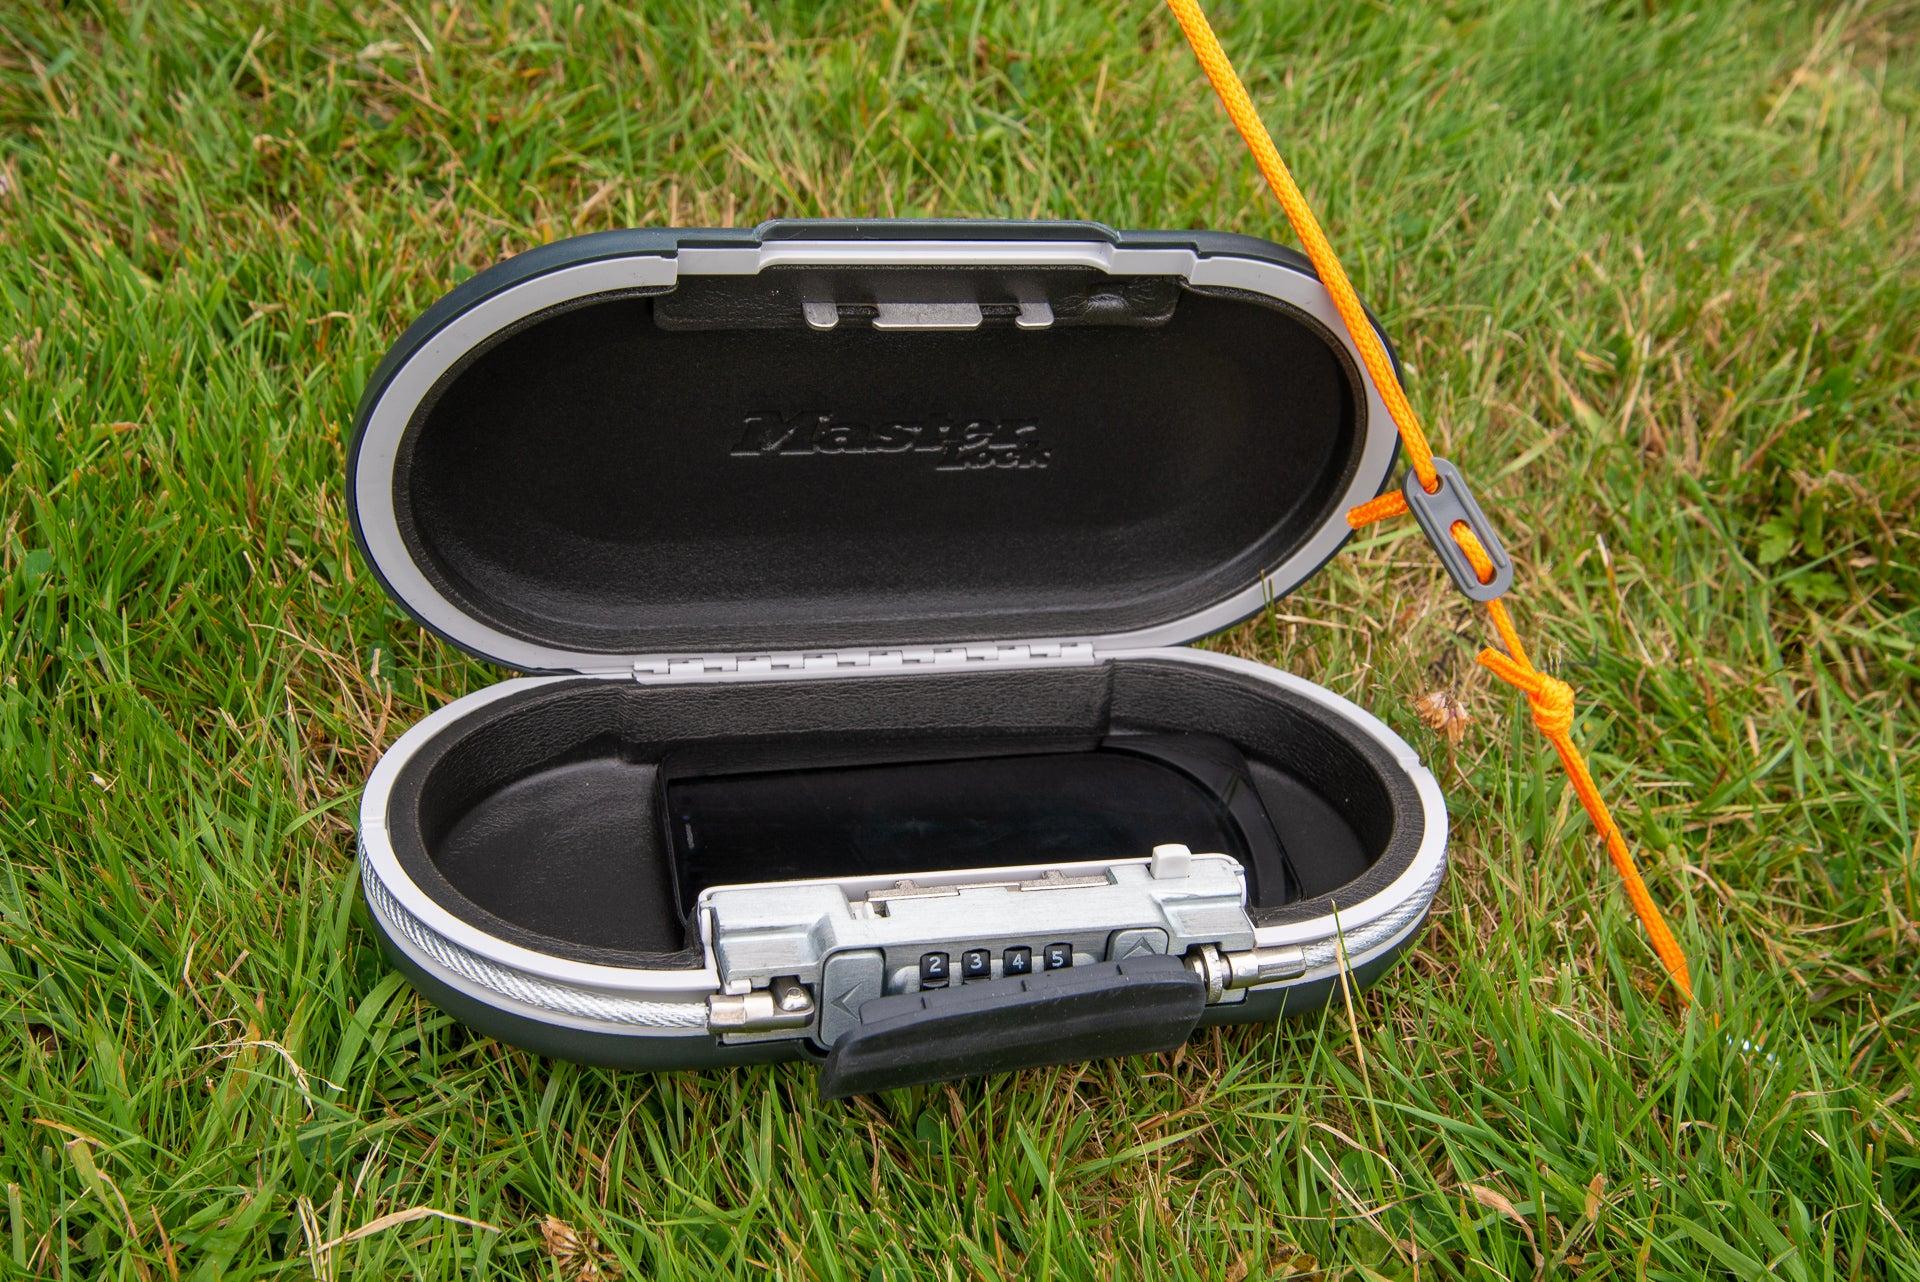 Master Lock Portable Safe